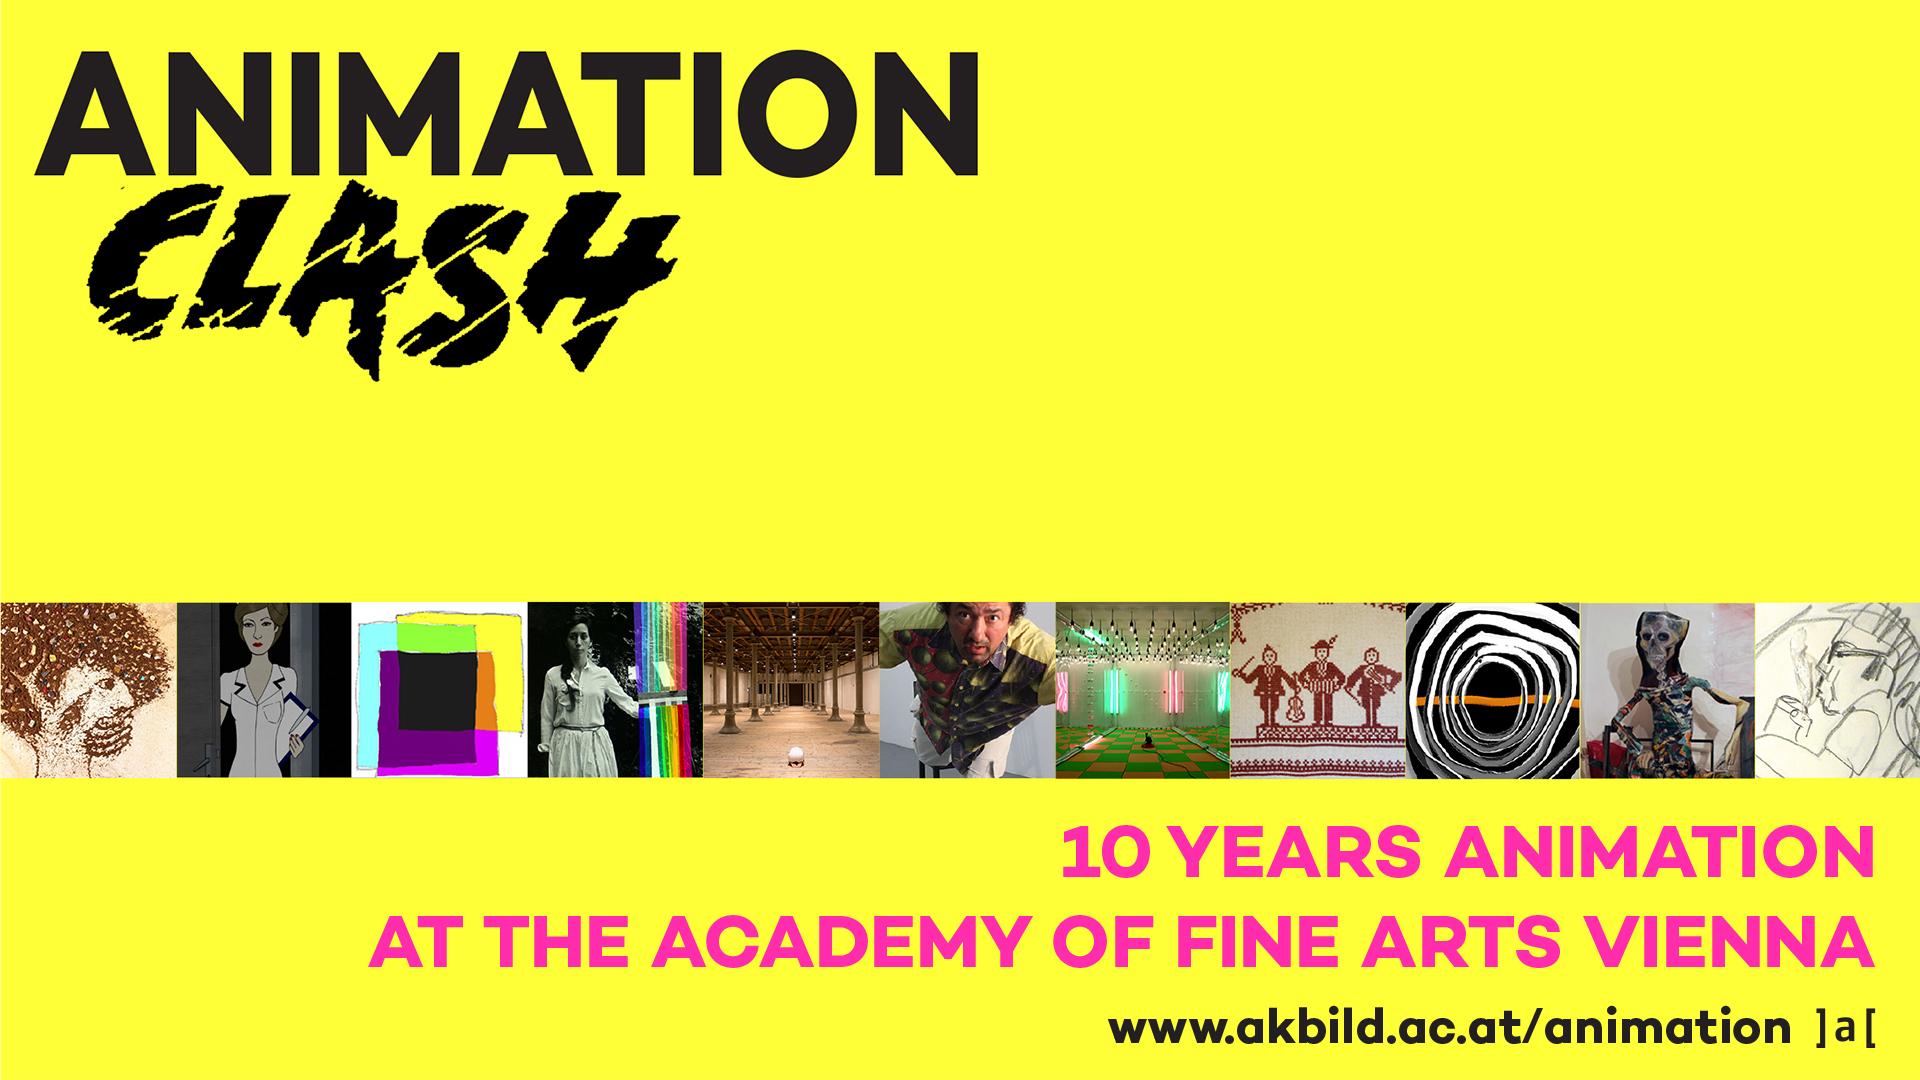 Animation_Clash_002